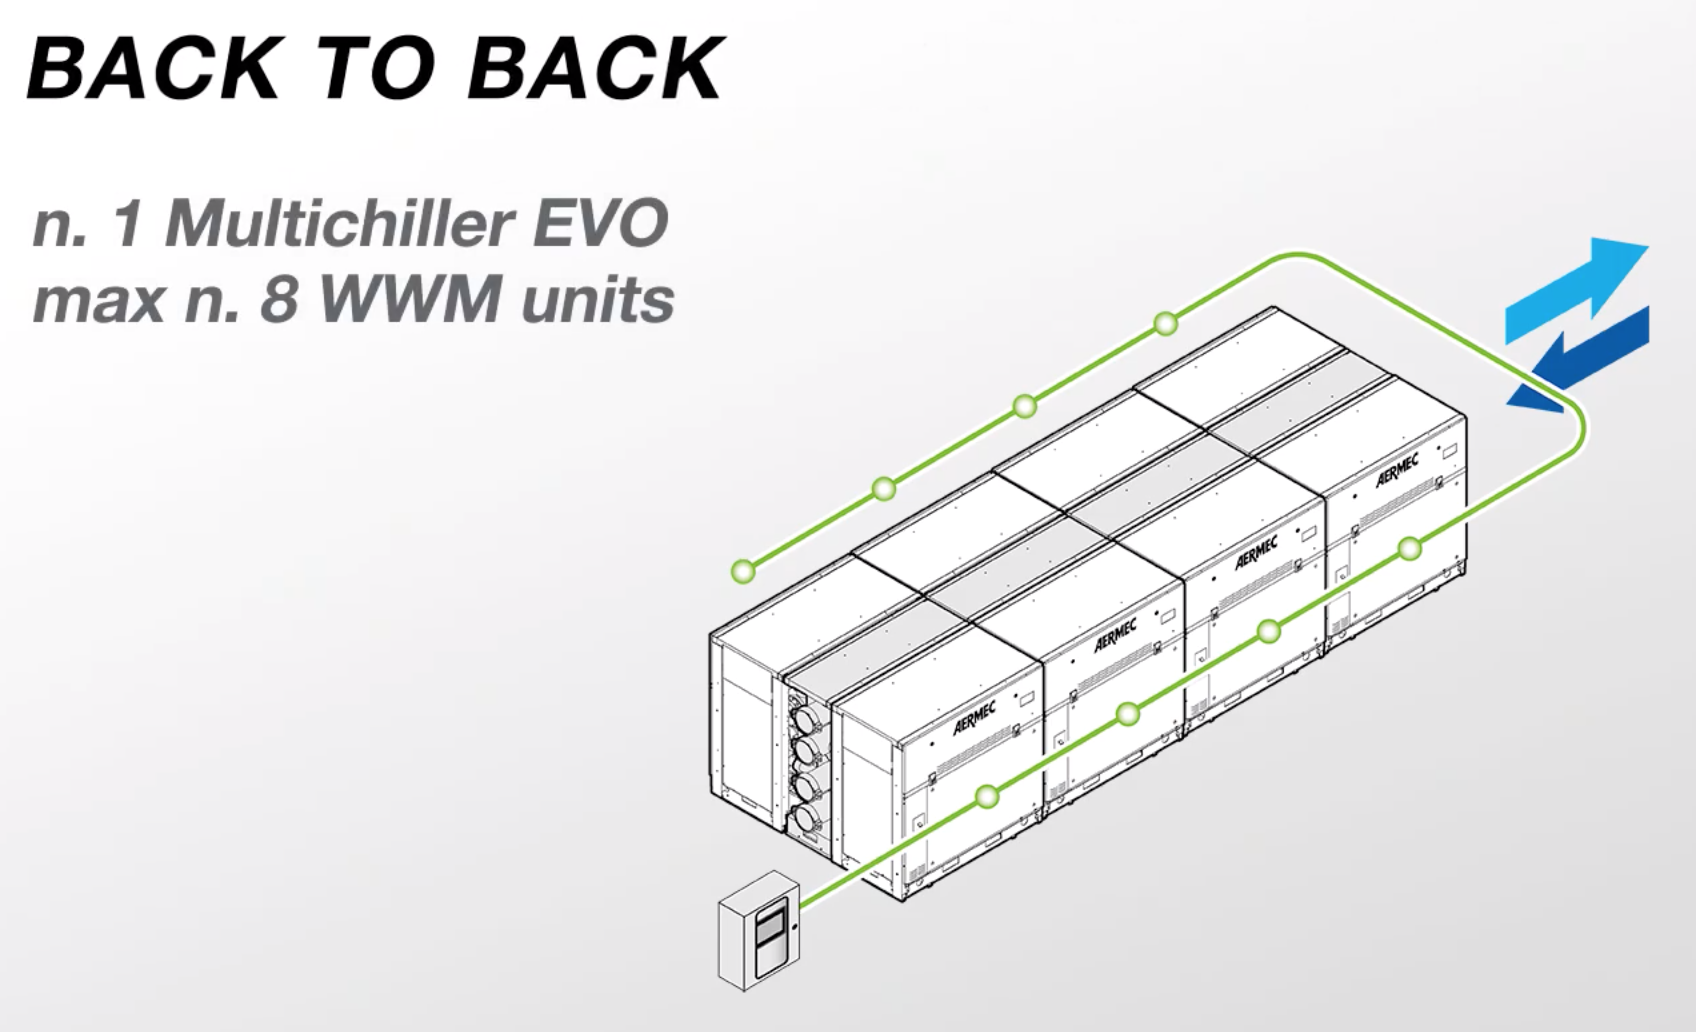 Aermec WWM Modular Chiller - Configuration Back-to-Back